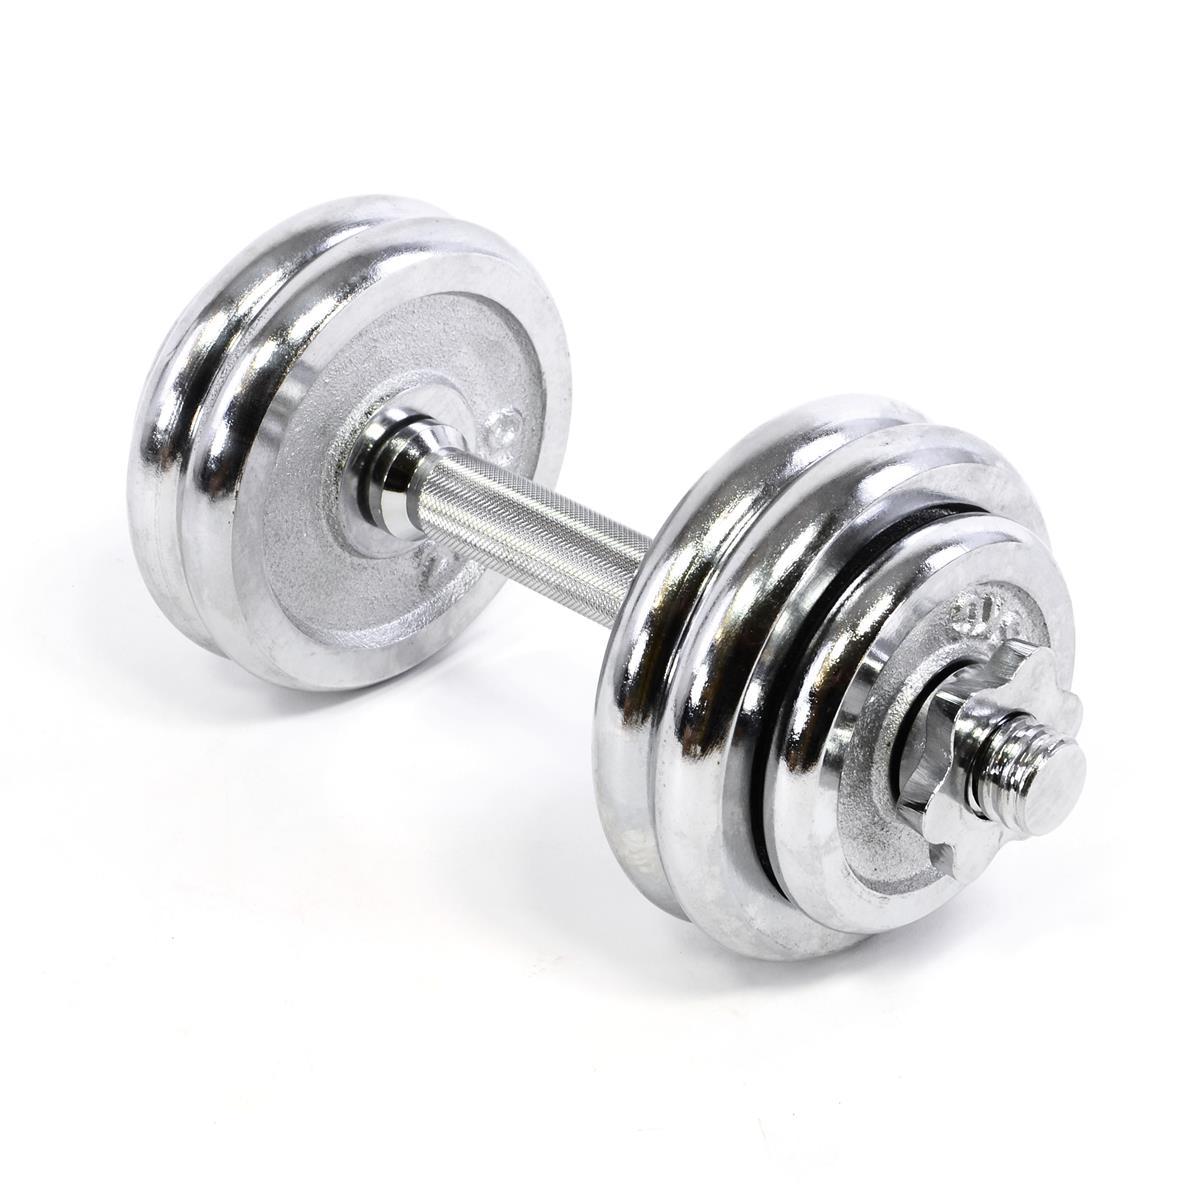 Profi Kurzhantelset Chrom Kurzhantel Hantelset Gewichte bis 15 kg Fitness Set